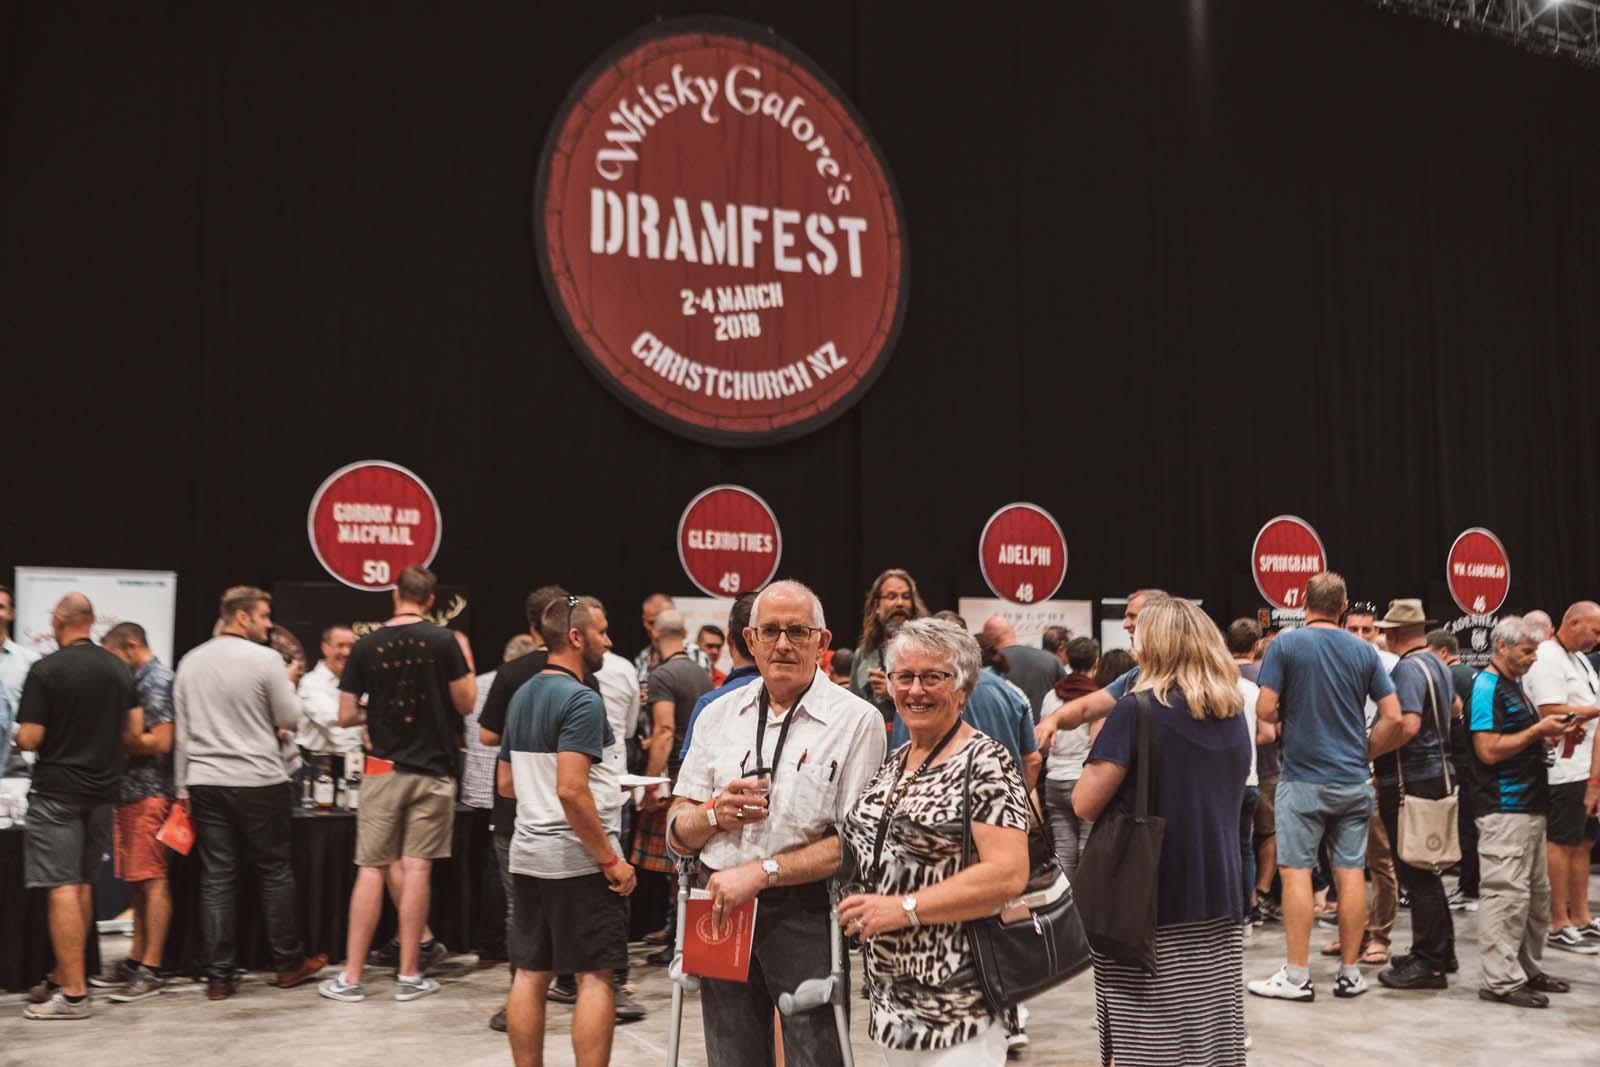 Dramfest 2018 for Whisky Galore-311.jpg